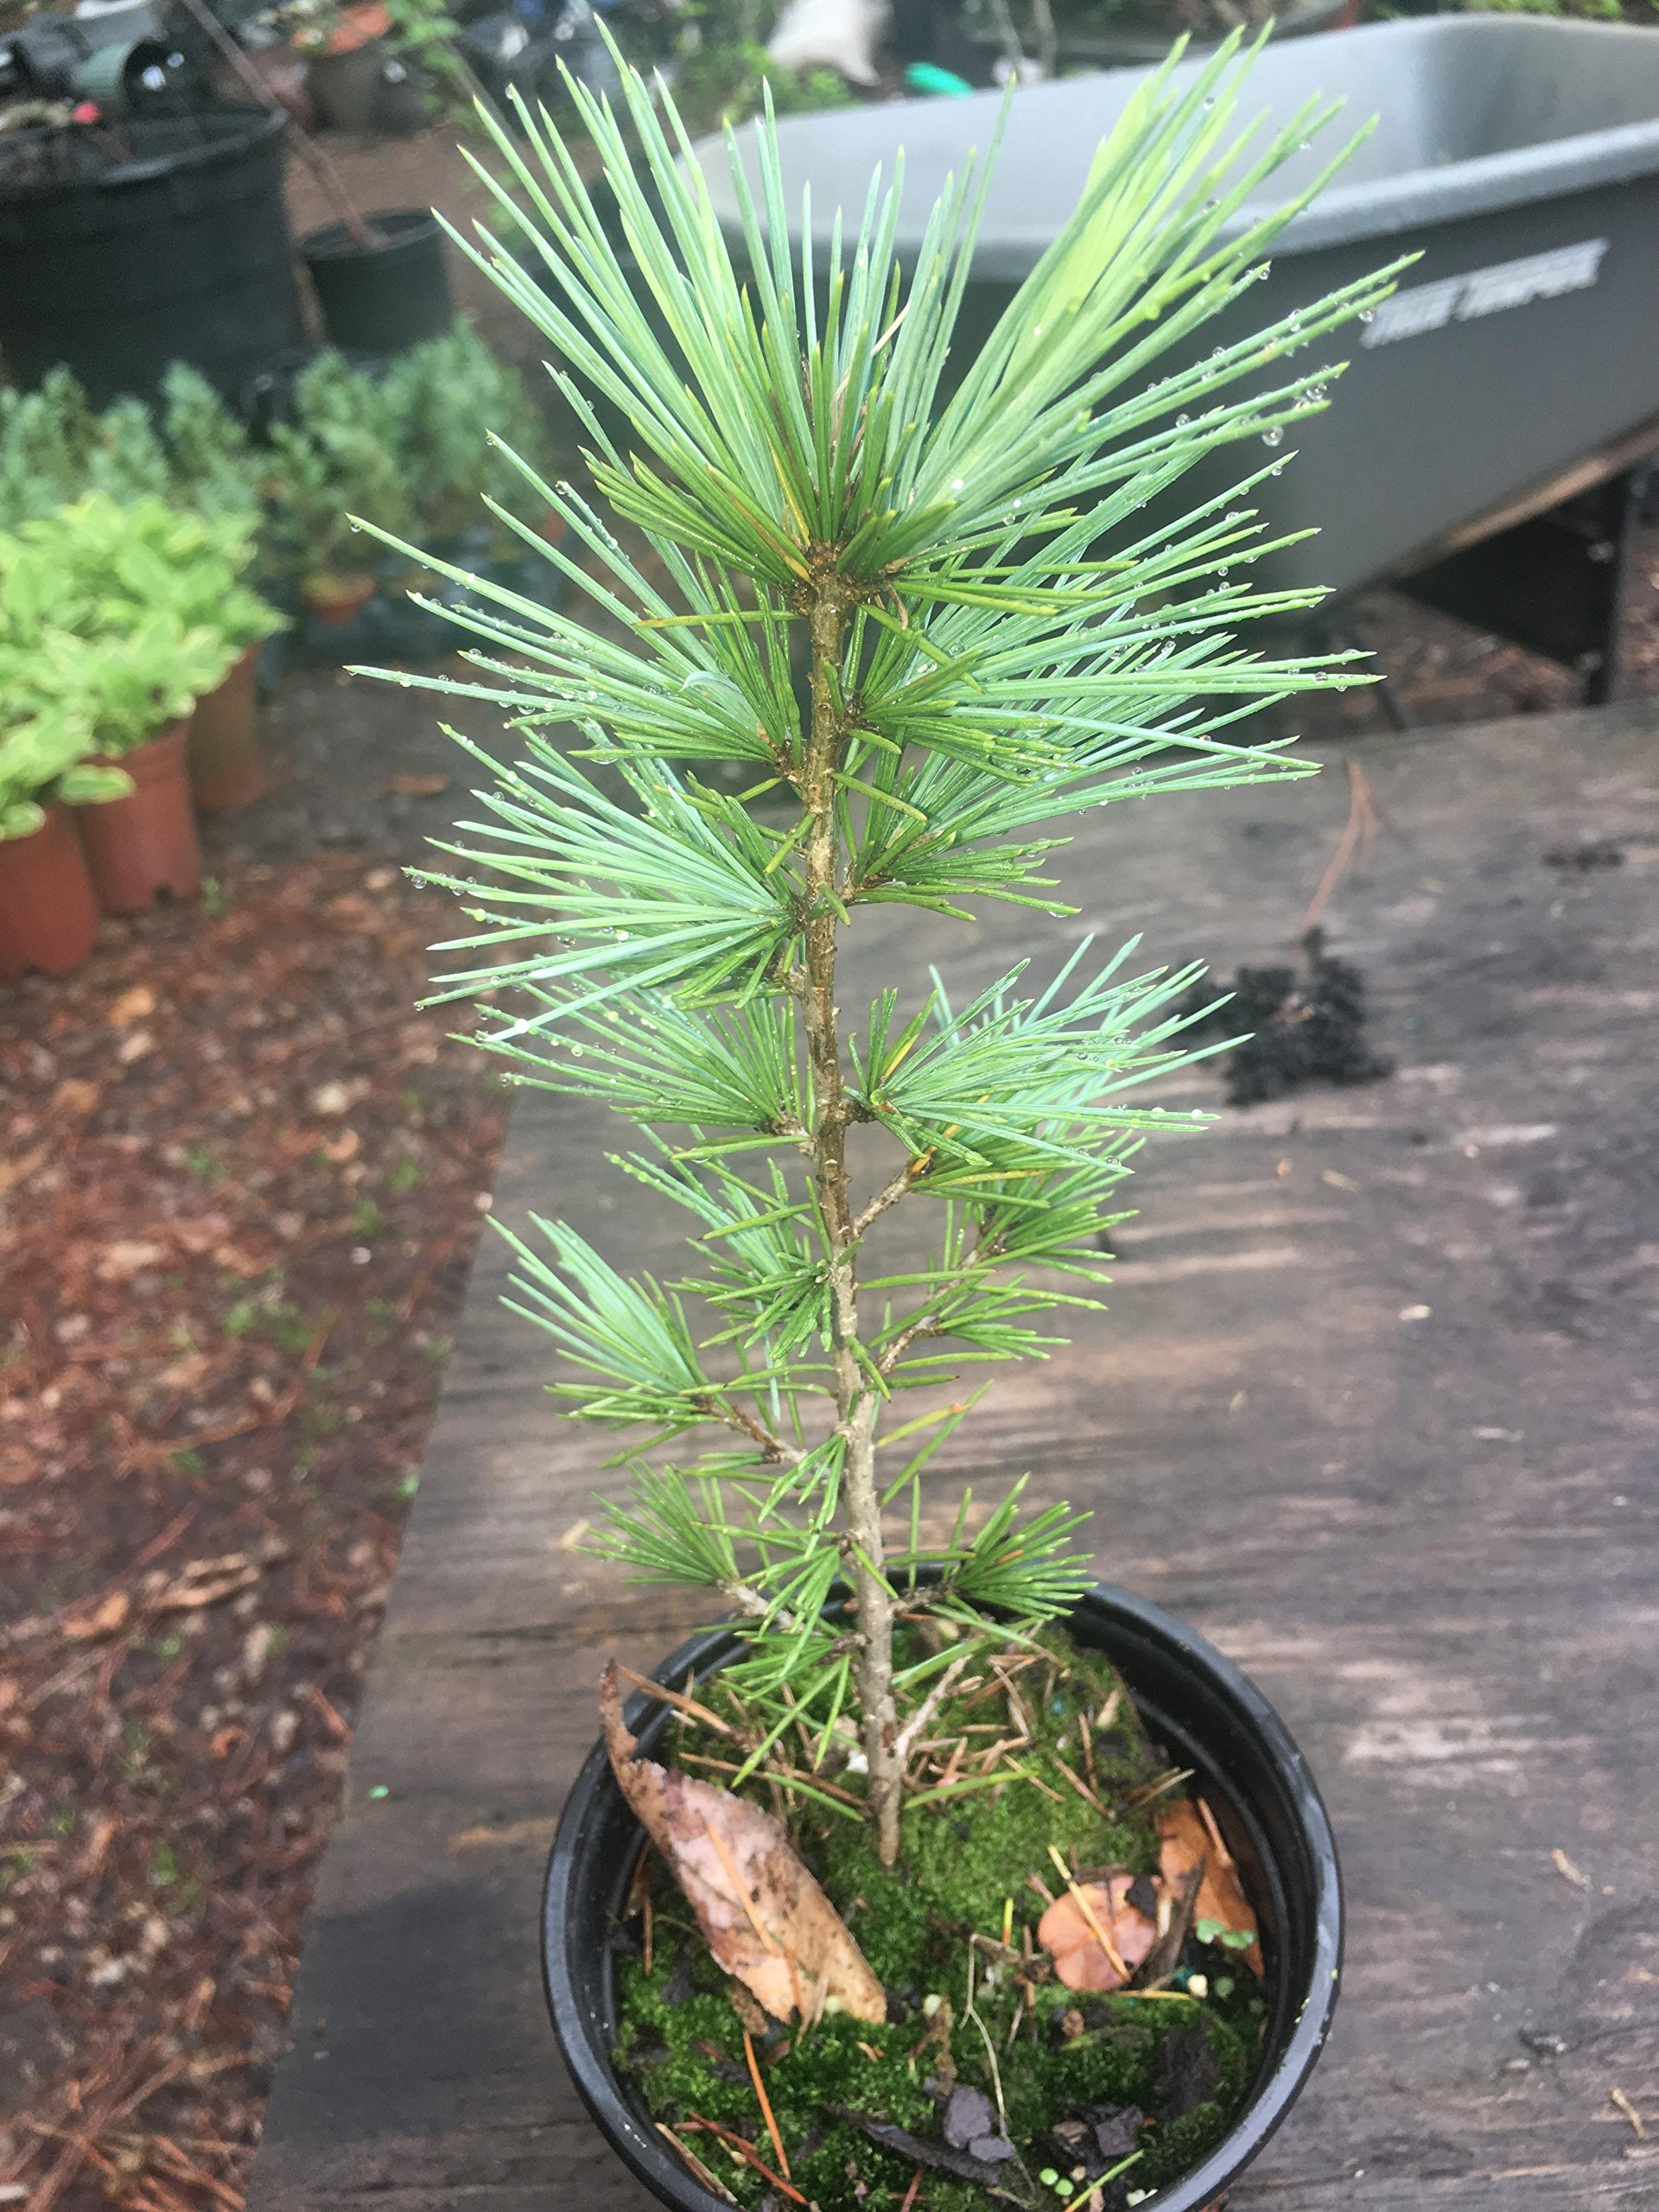 (Quart) blue deodara cedrus Electra Blue Deodar Cedar. 30 feet. Sunlight.Quart size plant shipped in plastic bag or 3'' pot.